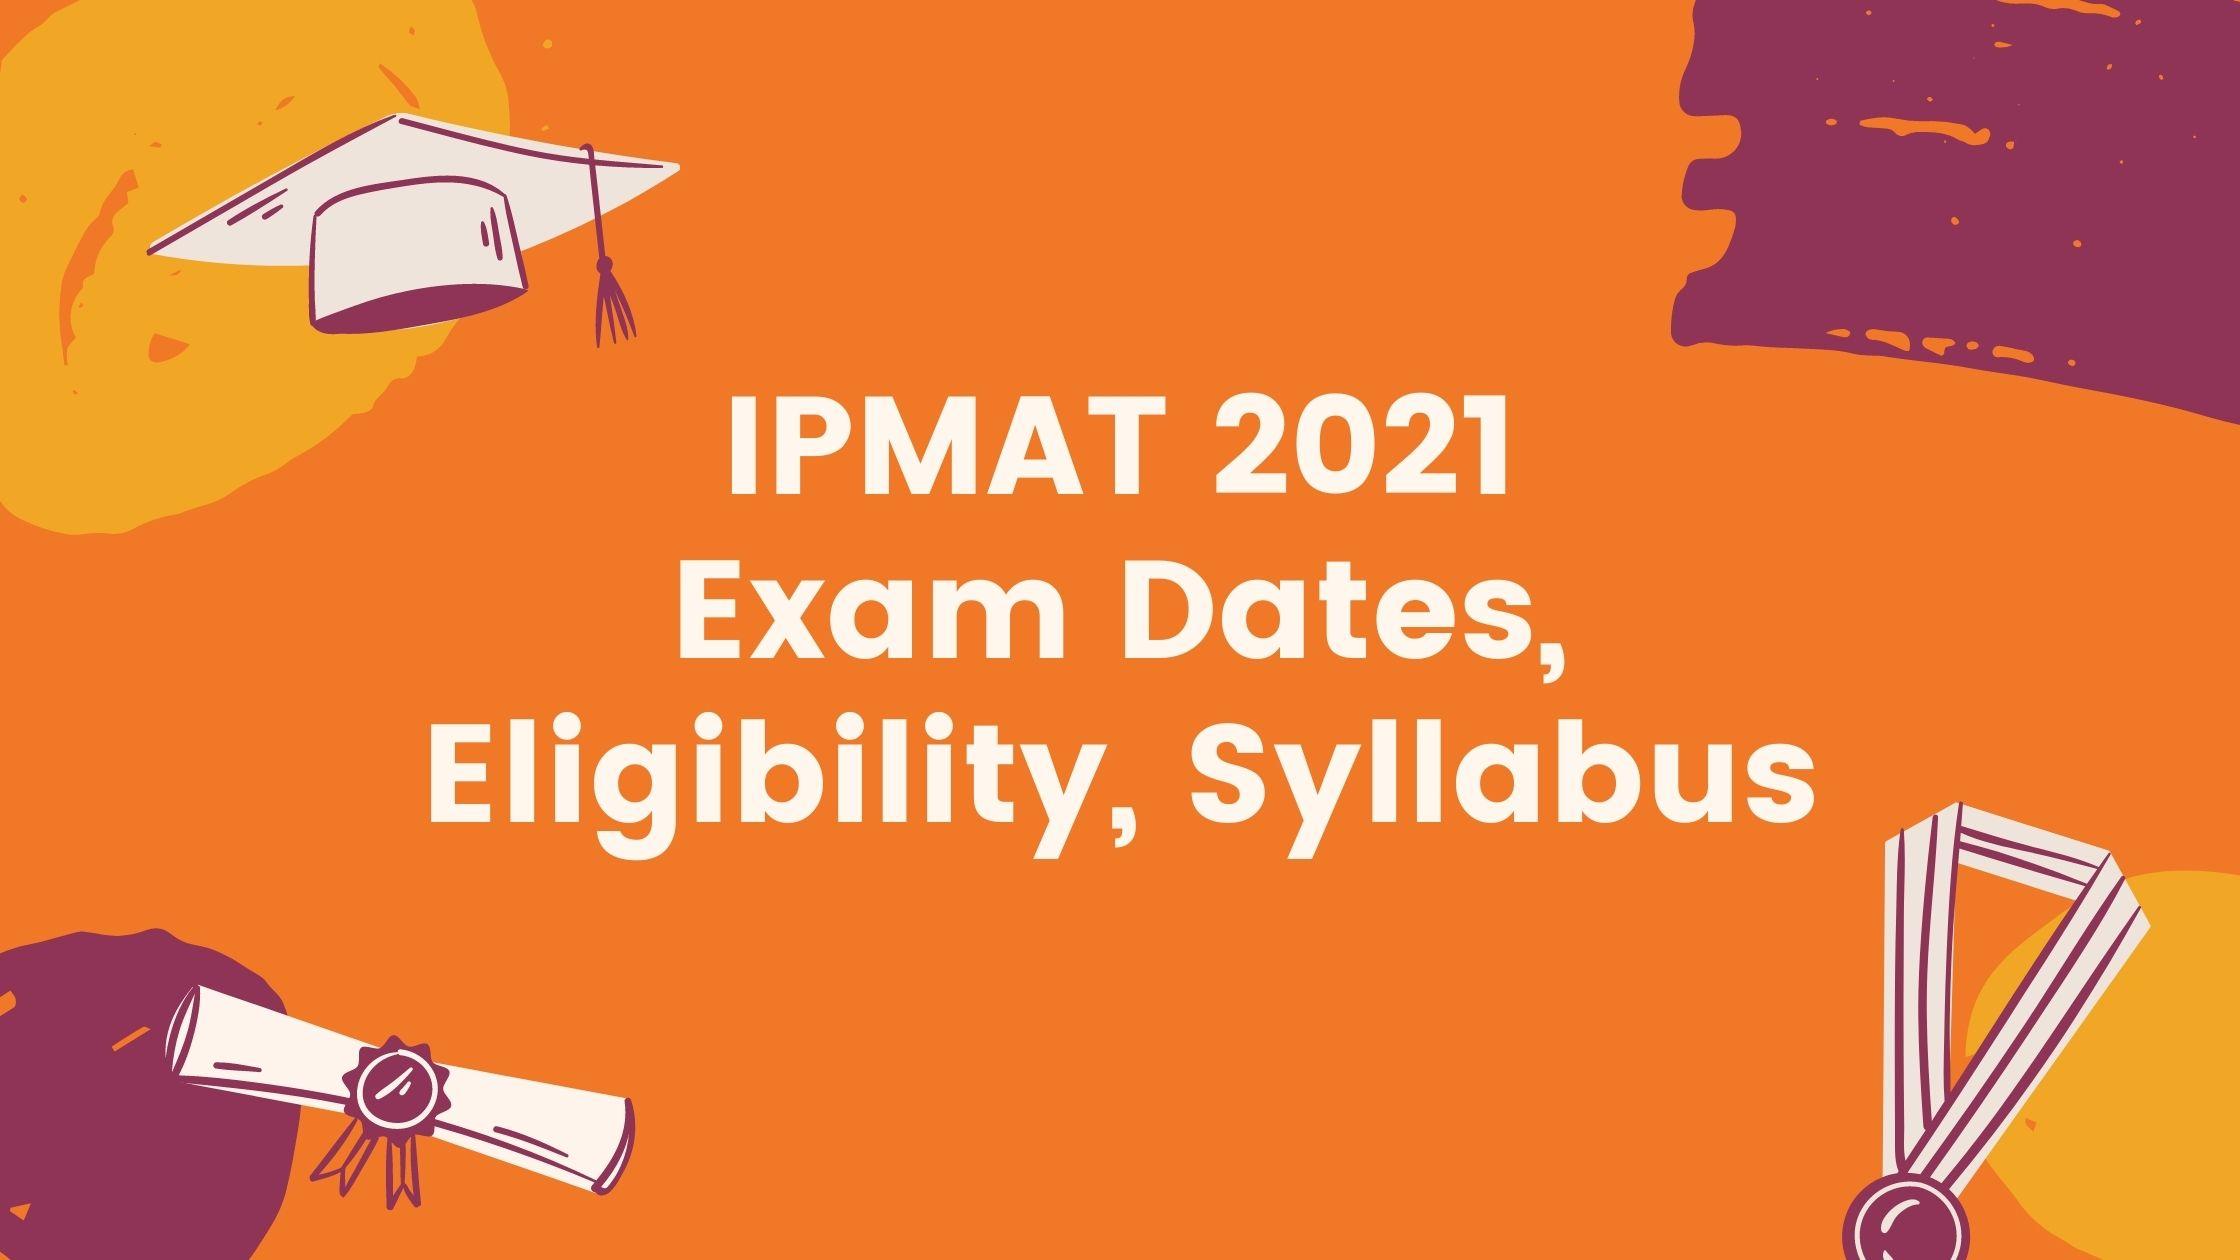 IPMAT 2021 : Exam Dates 2021, Eligibility, Syllabus, Marking scheme